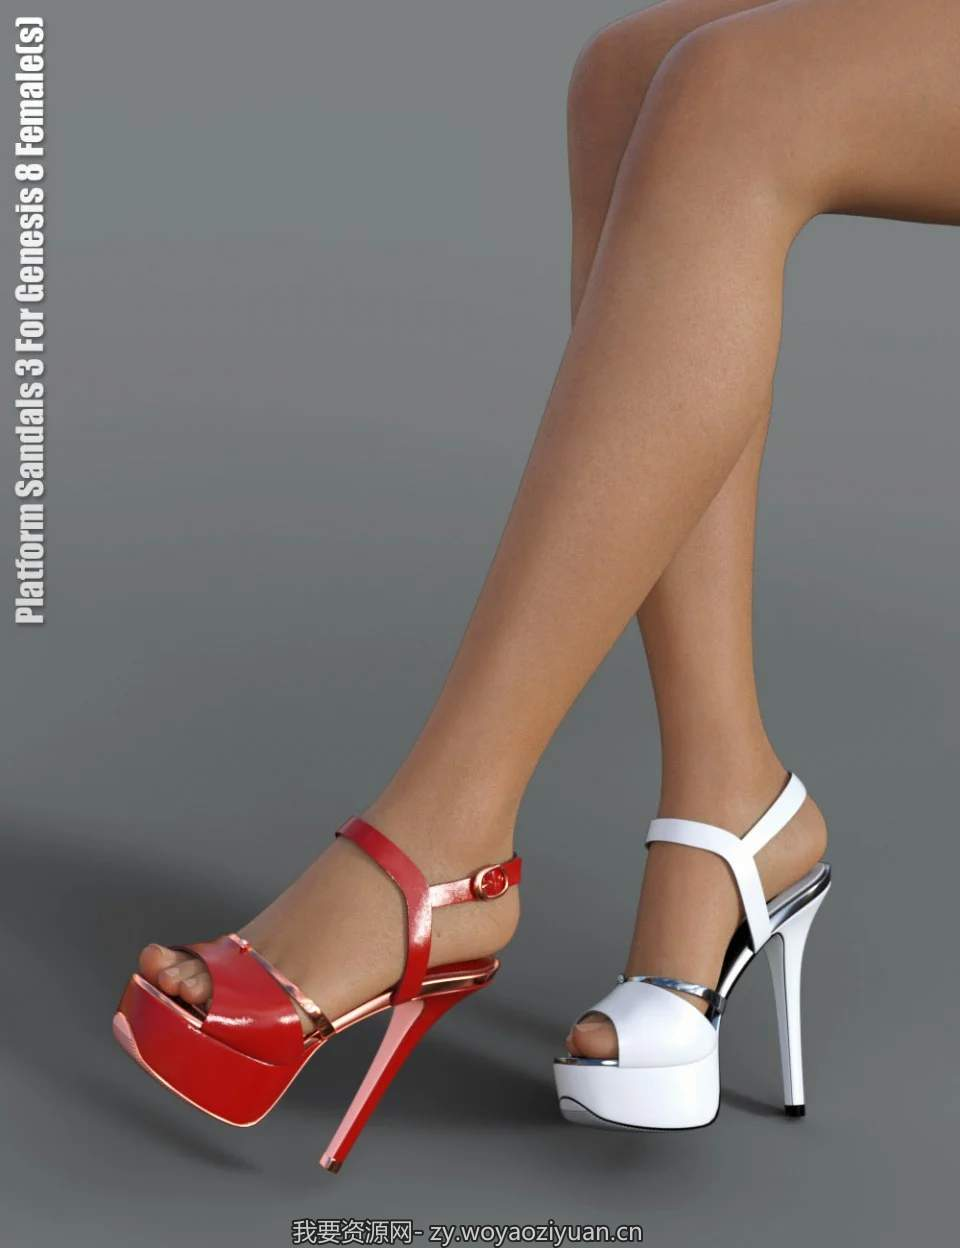 Platform Sandals 3 for Genesis 8 Female(s)